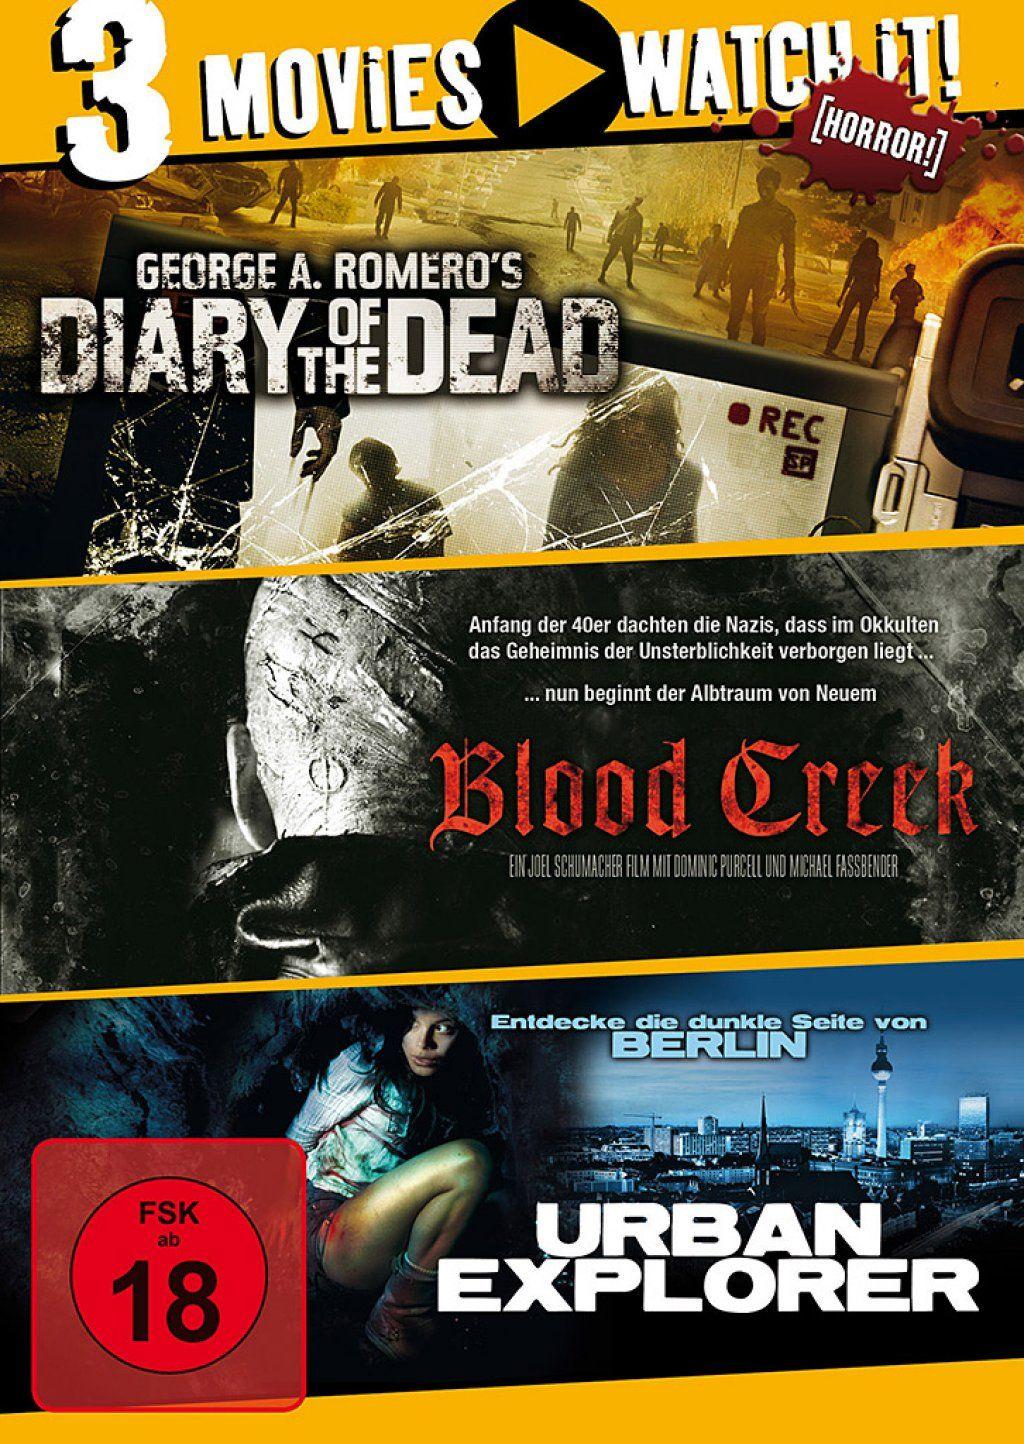 Diary of the Dead / Blood Creek / Urban Explorer (3 Discs)